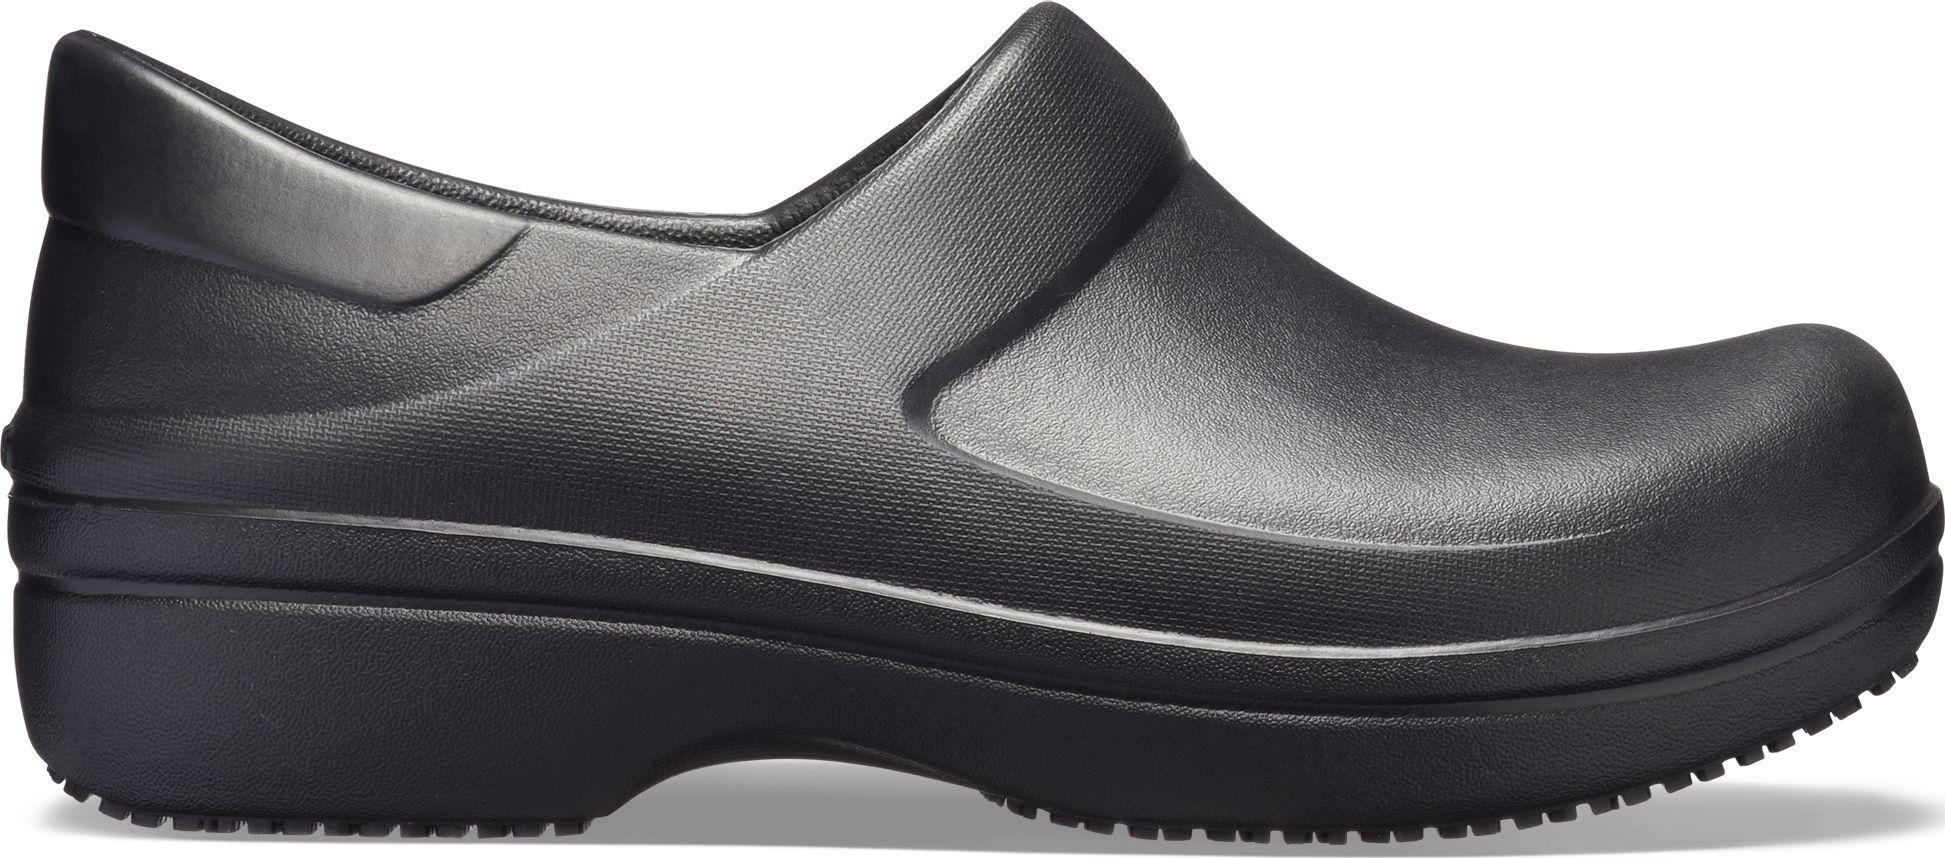 Crocs™ Women's Neria Pro II Clog Black 38,5